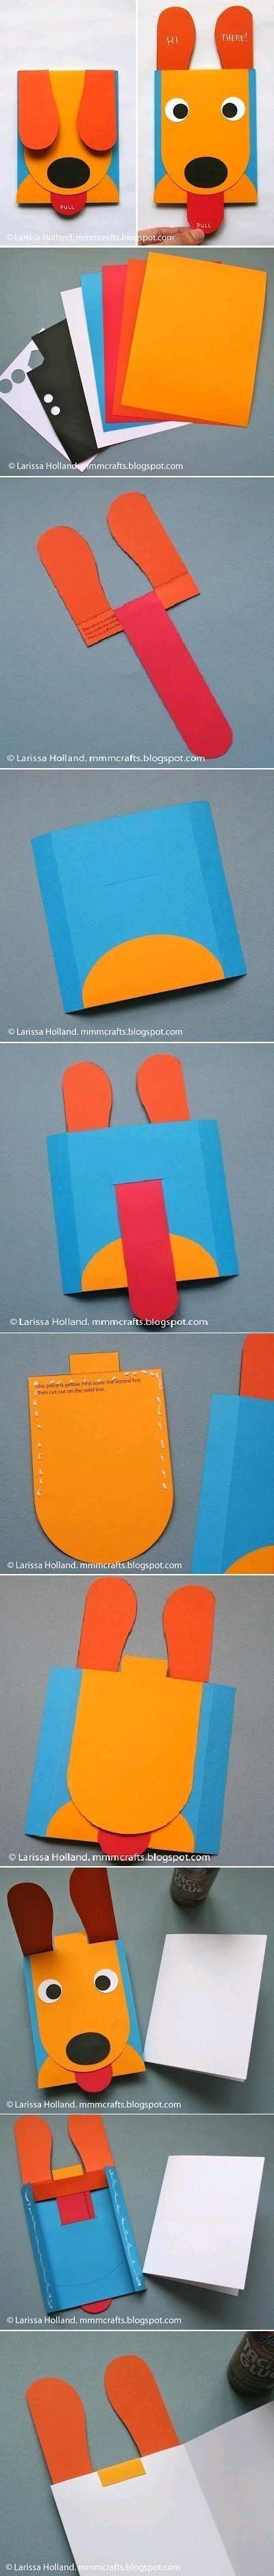 DIY Puppy Fun Card DIY Projects / UsefulDIY.com on imgfave